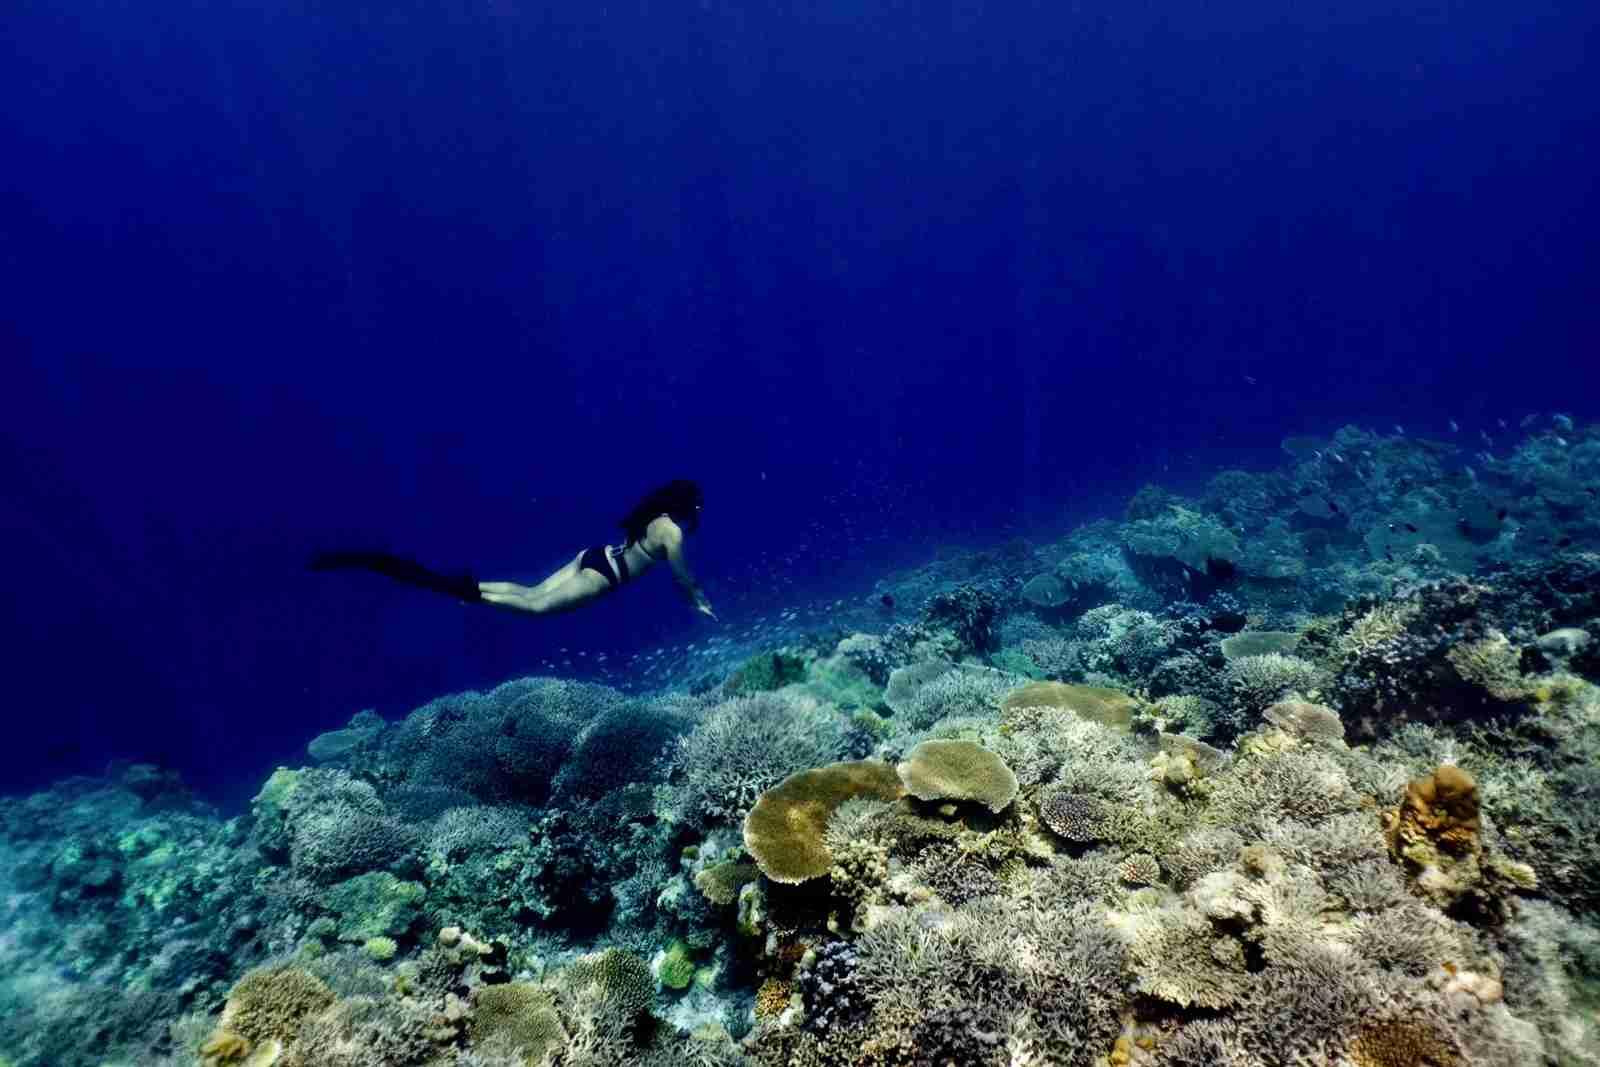 The Apo Reef in Sablayan. (Photo by Farhan Sharief via Unsplash)